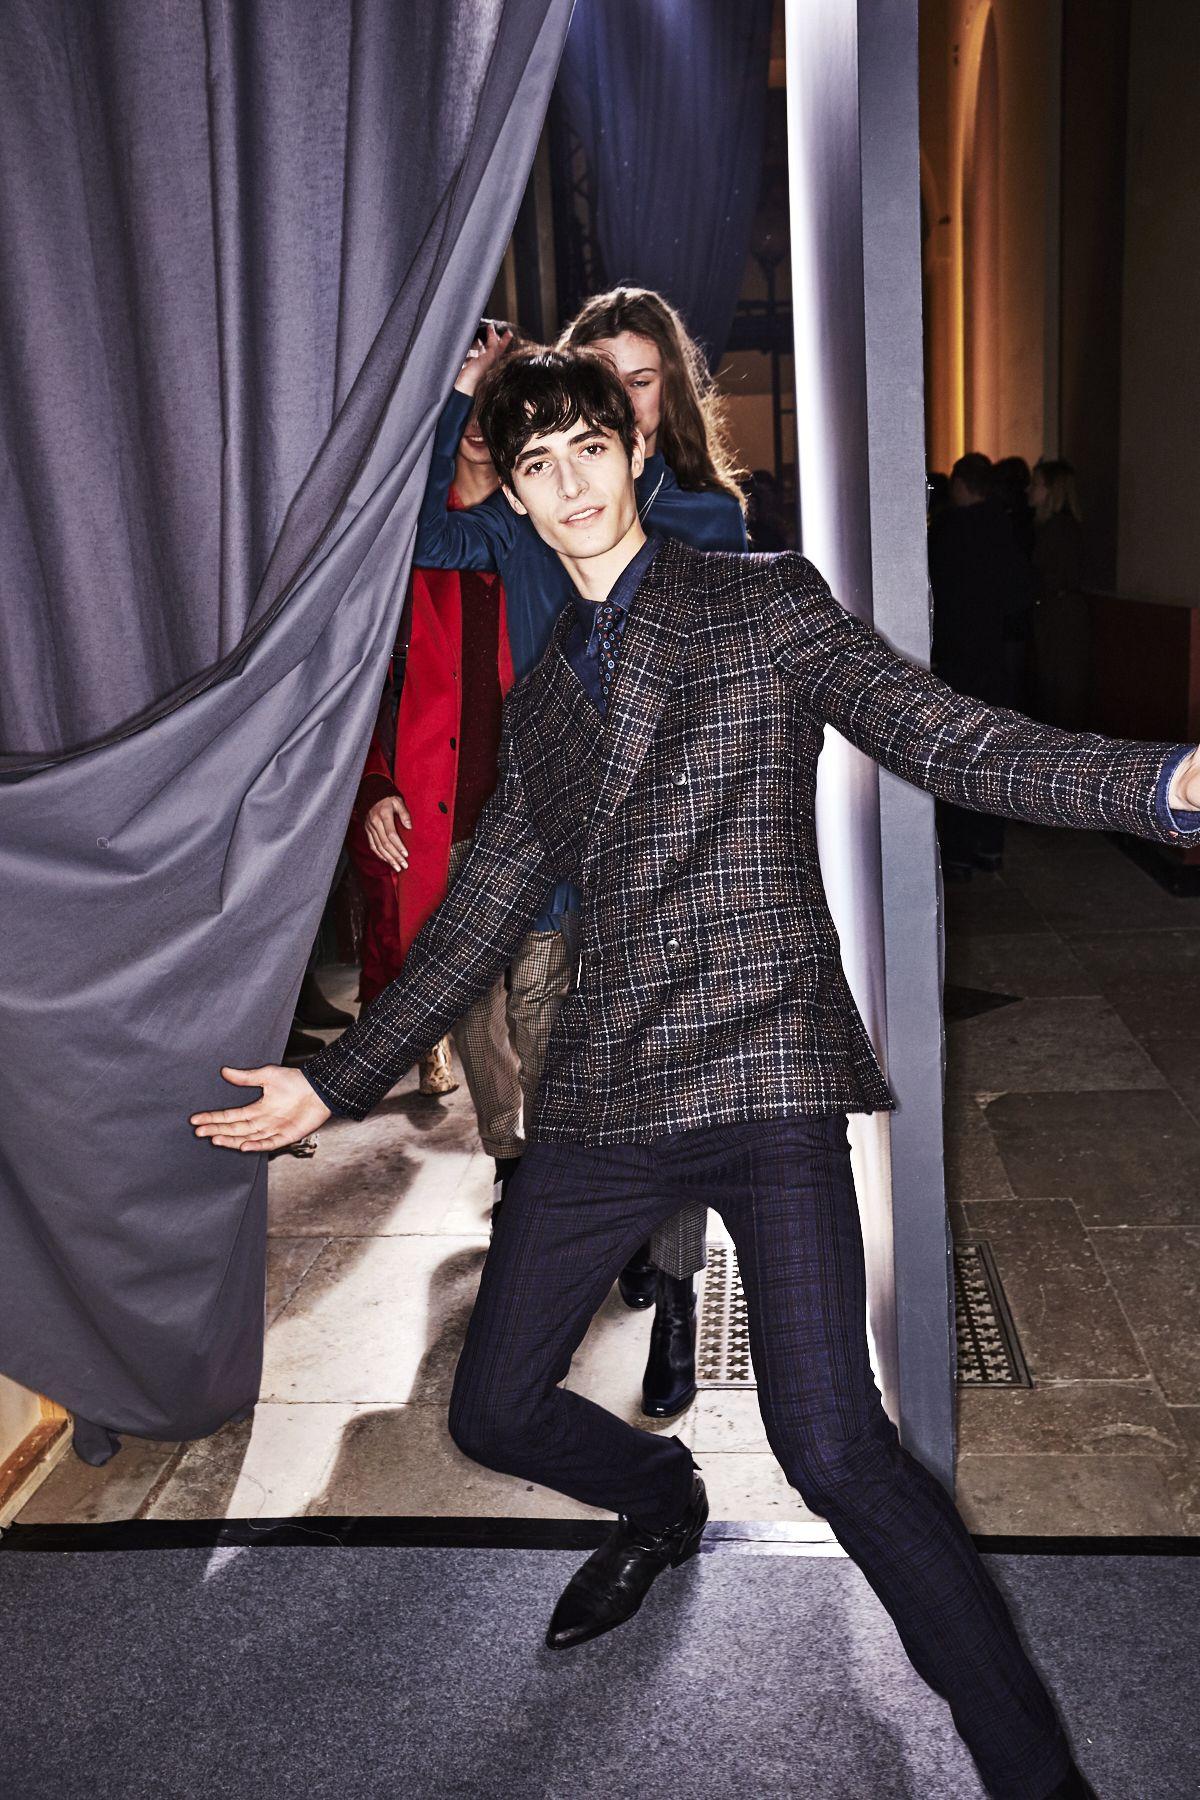 Paul Smith Fall 17 Men Fashion Show Paris Backstage